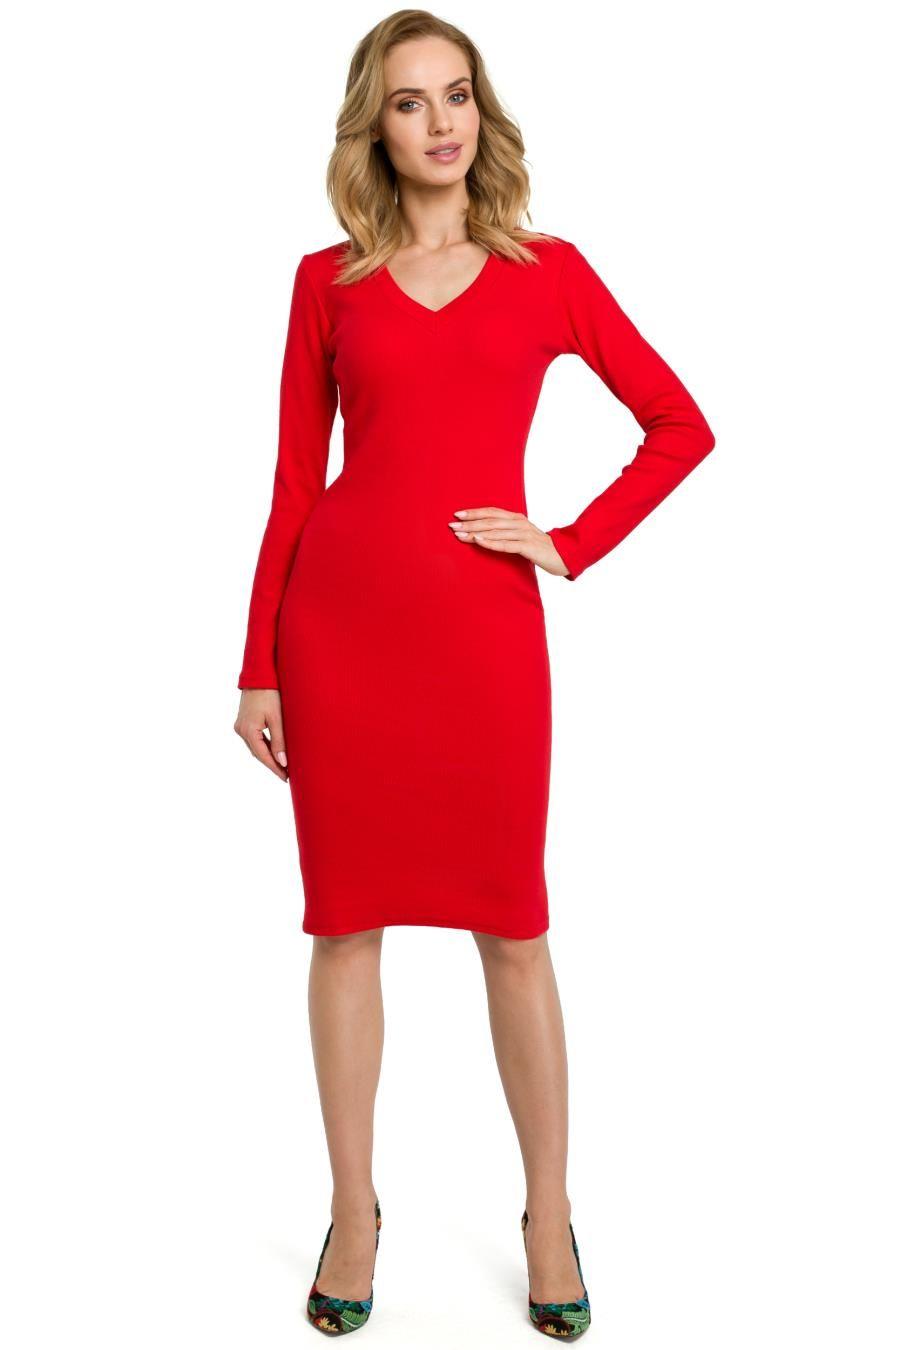 e527e635 Dopasowana Sukienka Czerwona MO393   Sukienka, Sukienki, Dresses ...